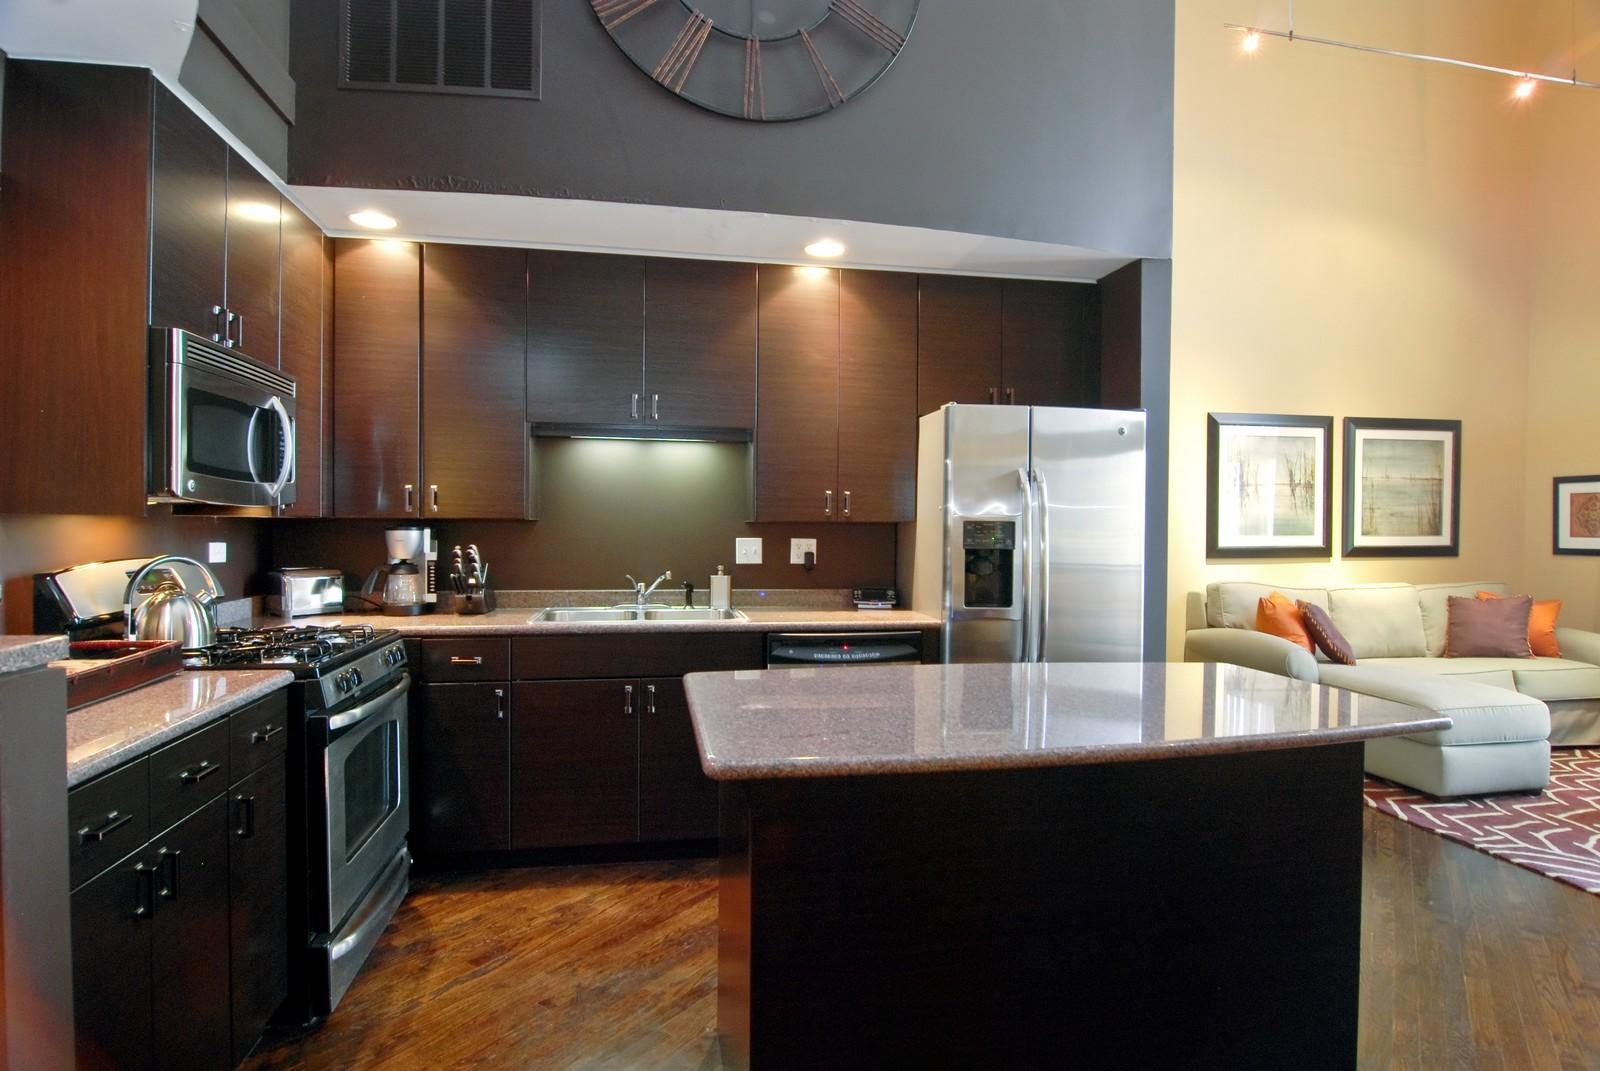 Real Estate Photography - 616 W Fulton, Unit 702, Chicago, IL, 60661 - Kitchen